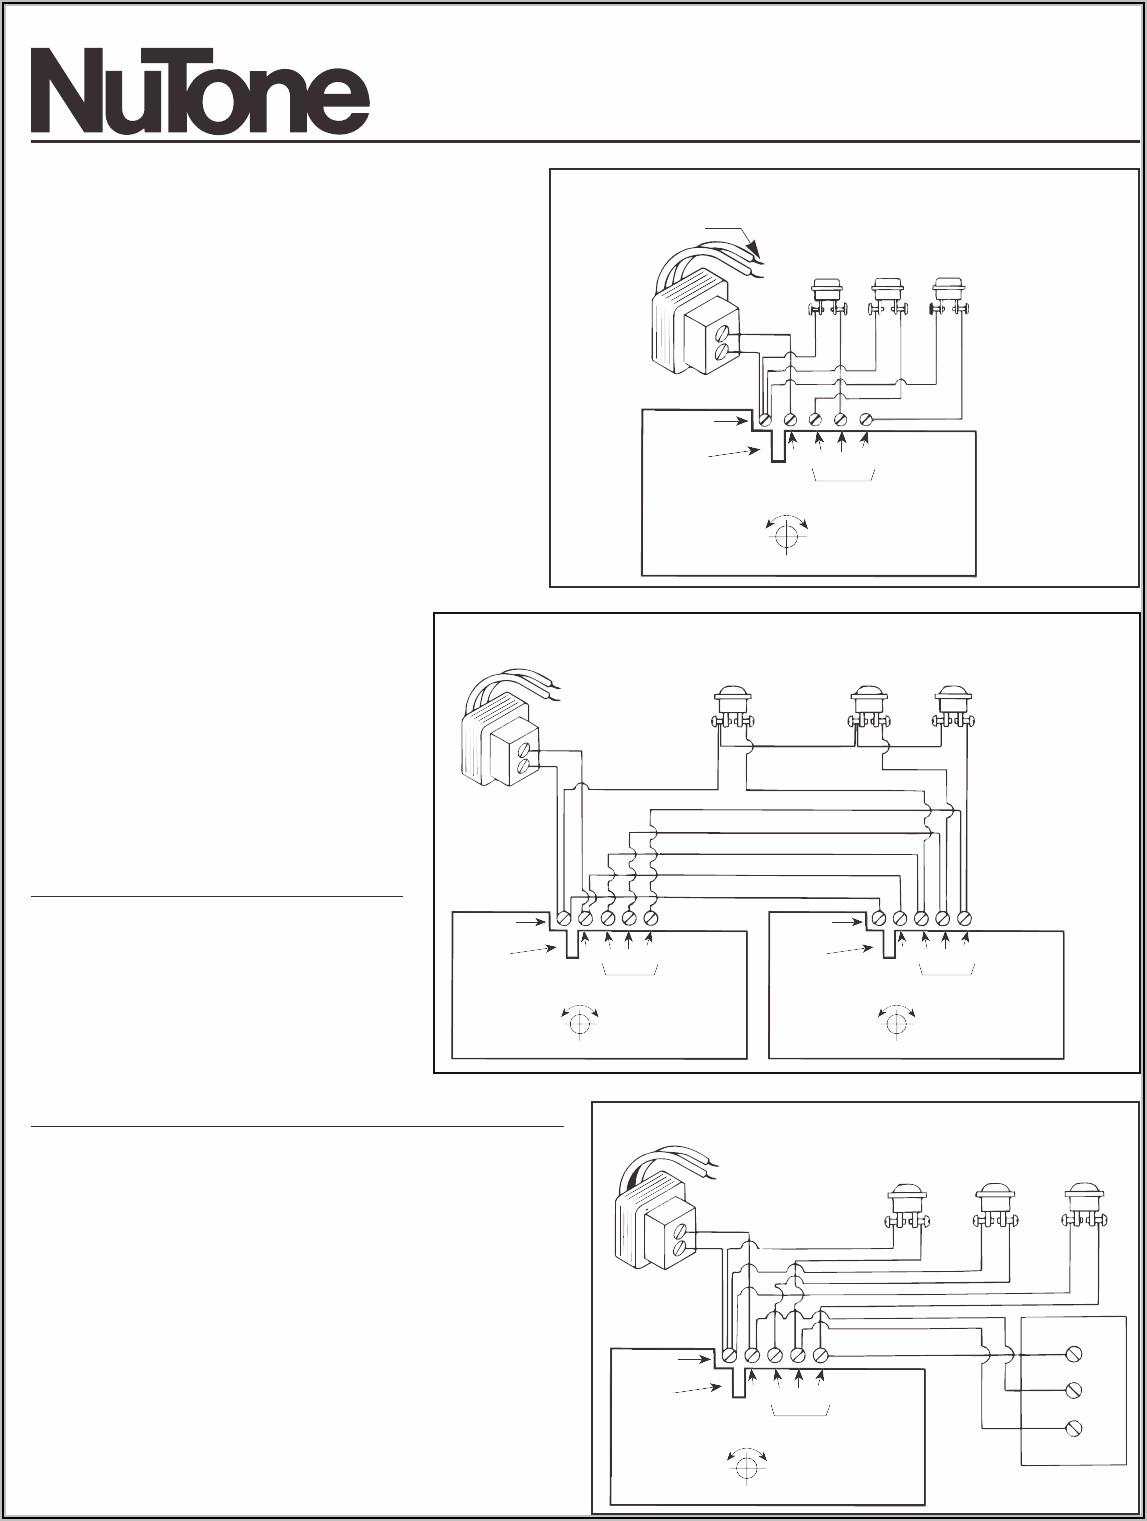 Ring Doorbell 3 Wiring Diagram